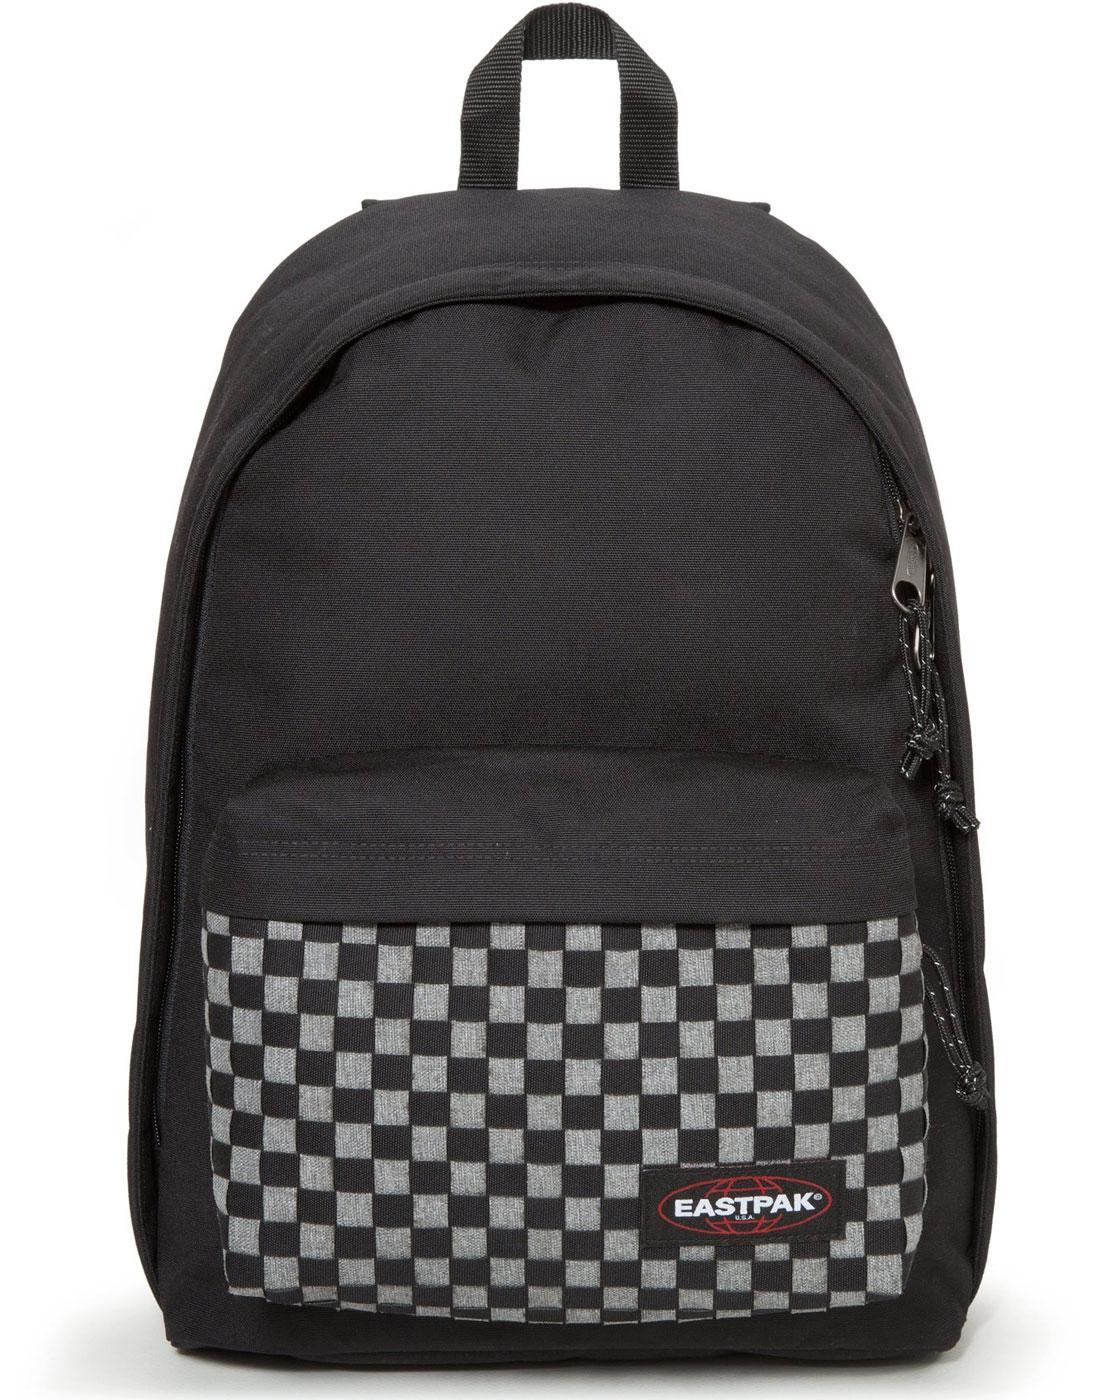 Out of Office EASTPAK Mod Ska Check Backpack B/G